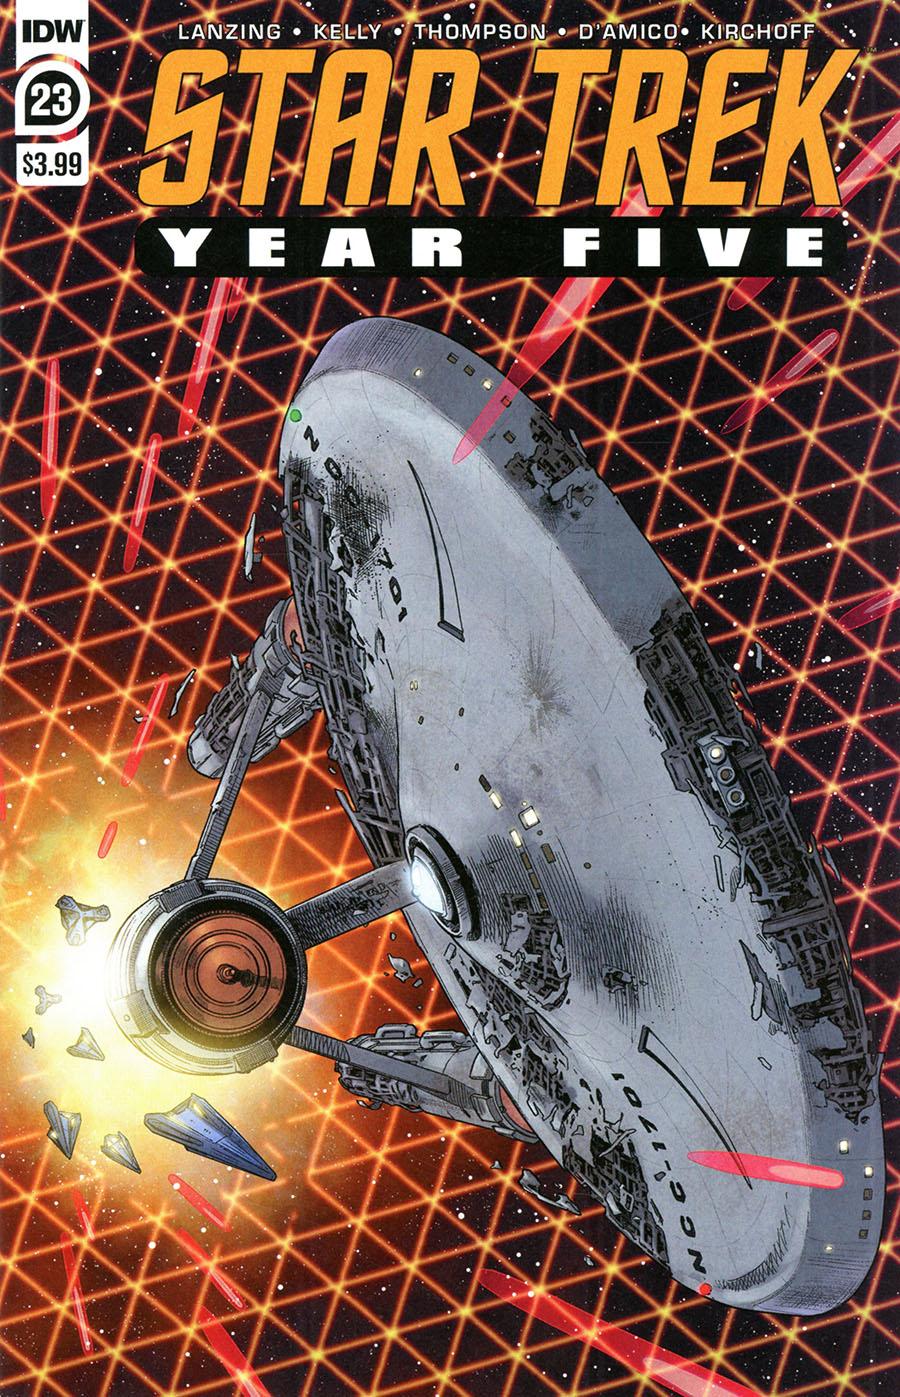 Star Trek Year Five #23 Cover A Regular Stephen Thompson Cover